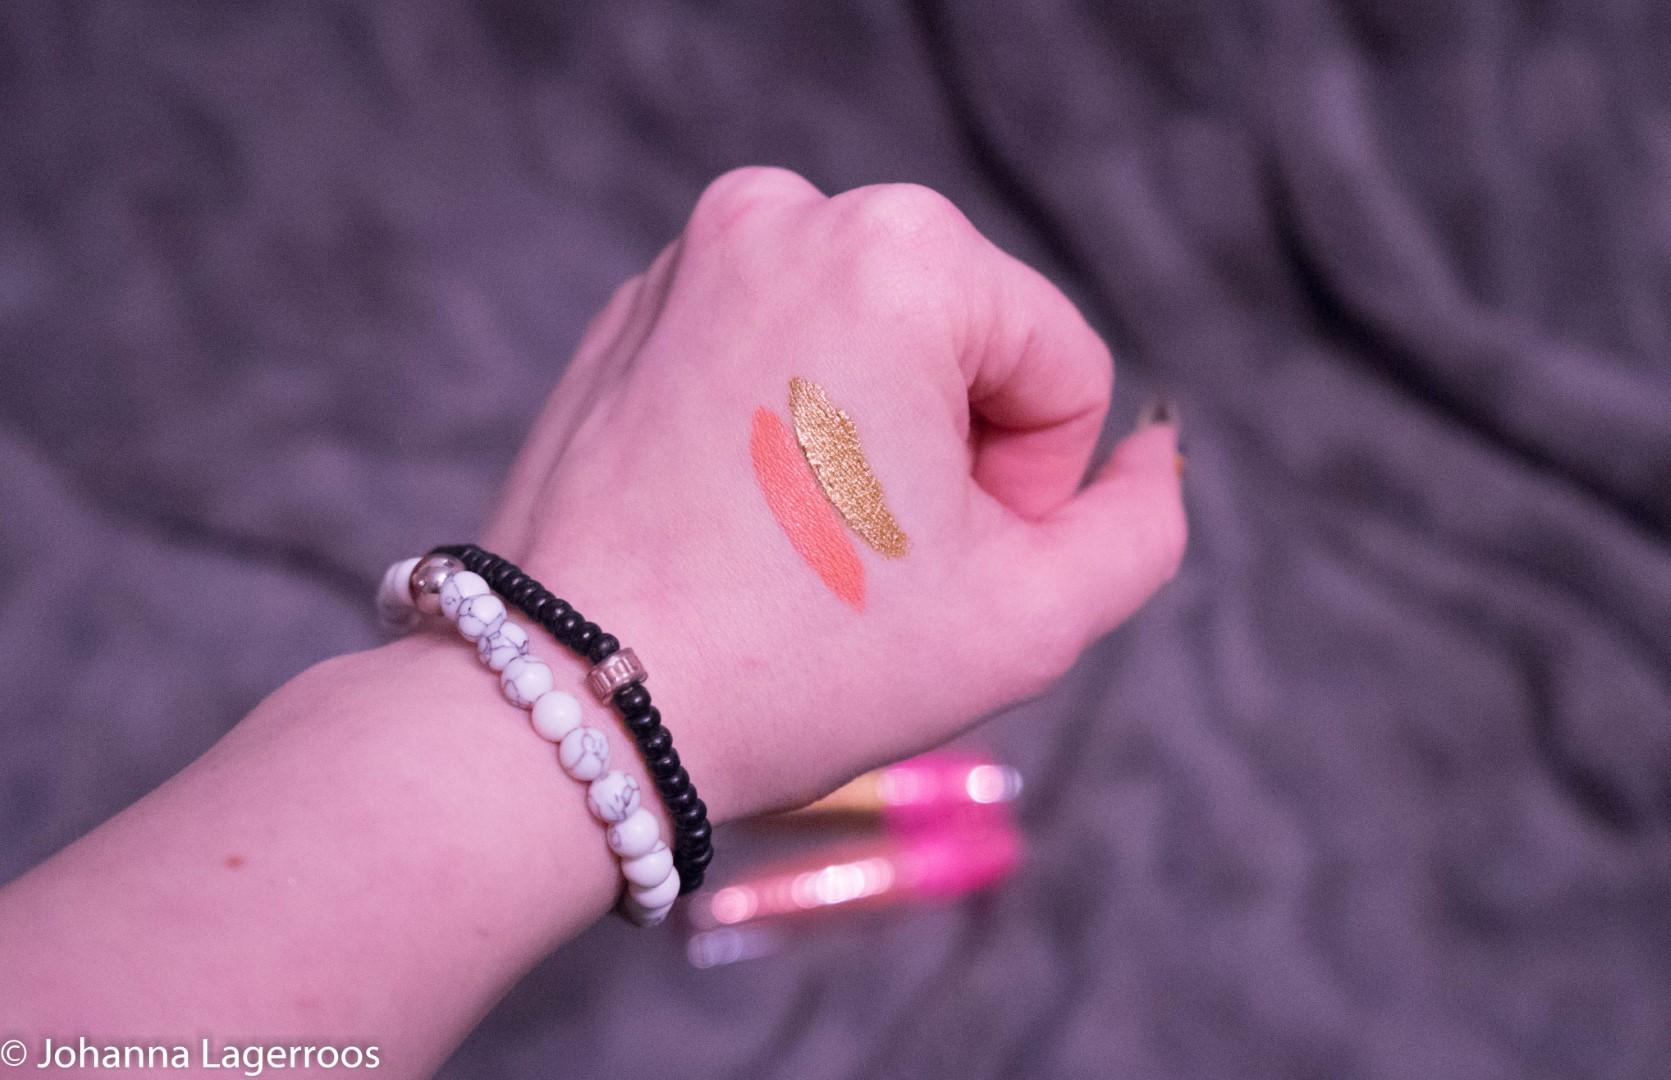 jsc lipstick swatches